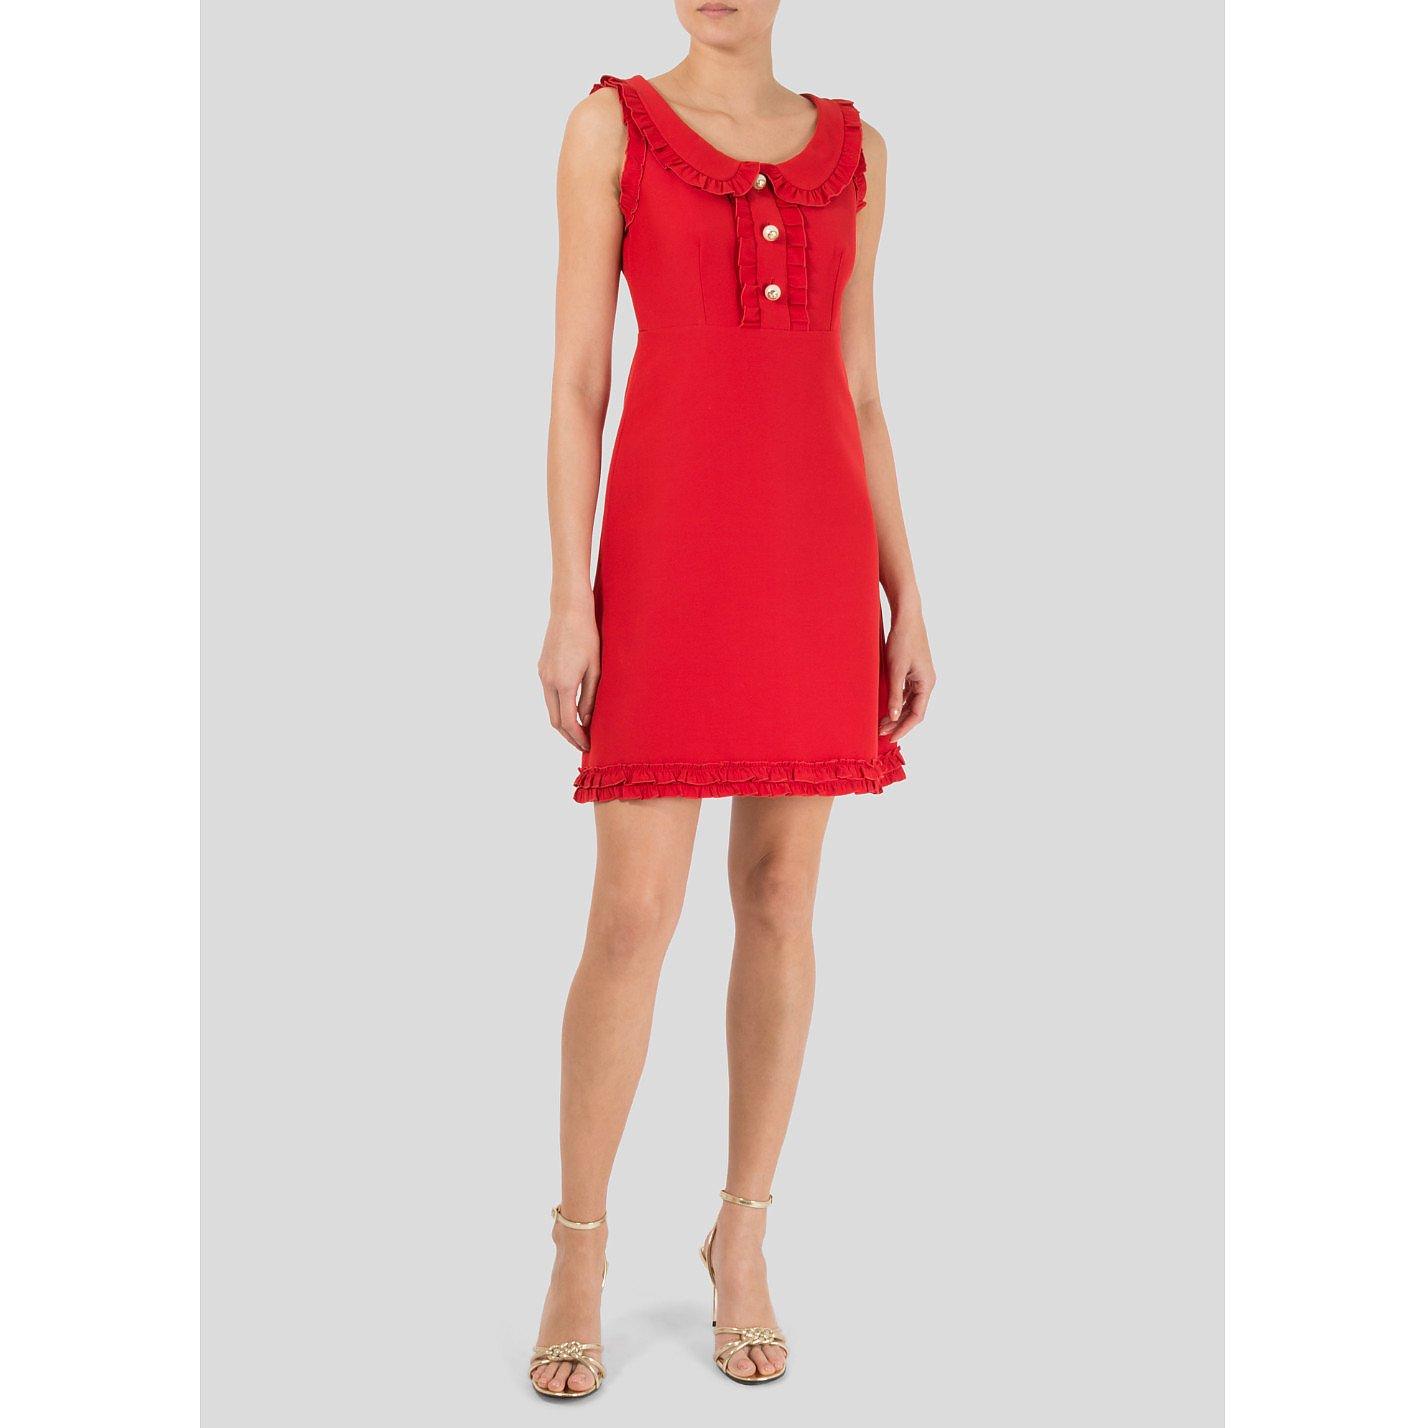 Gucci Ruffle-Trimmed Sleeveless Mini Dress